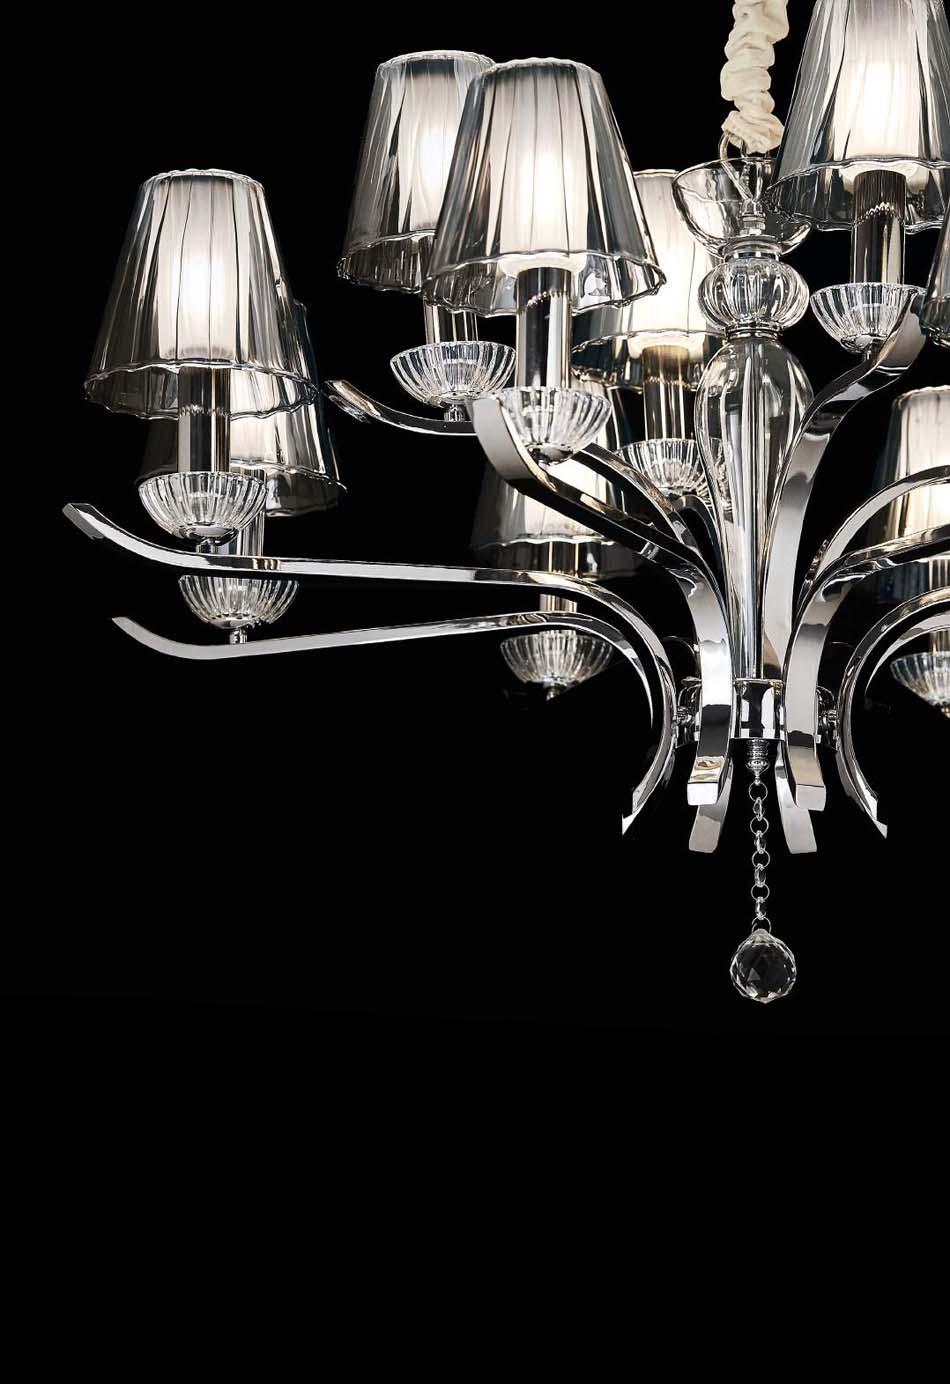 Lampade 47 sospese vintage Ideal Lux Event – Toscana Arredamenti